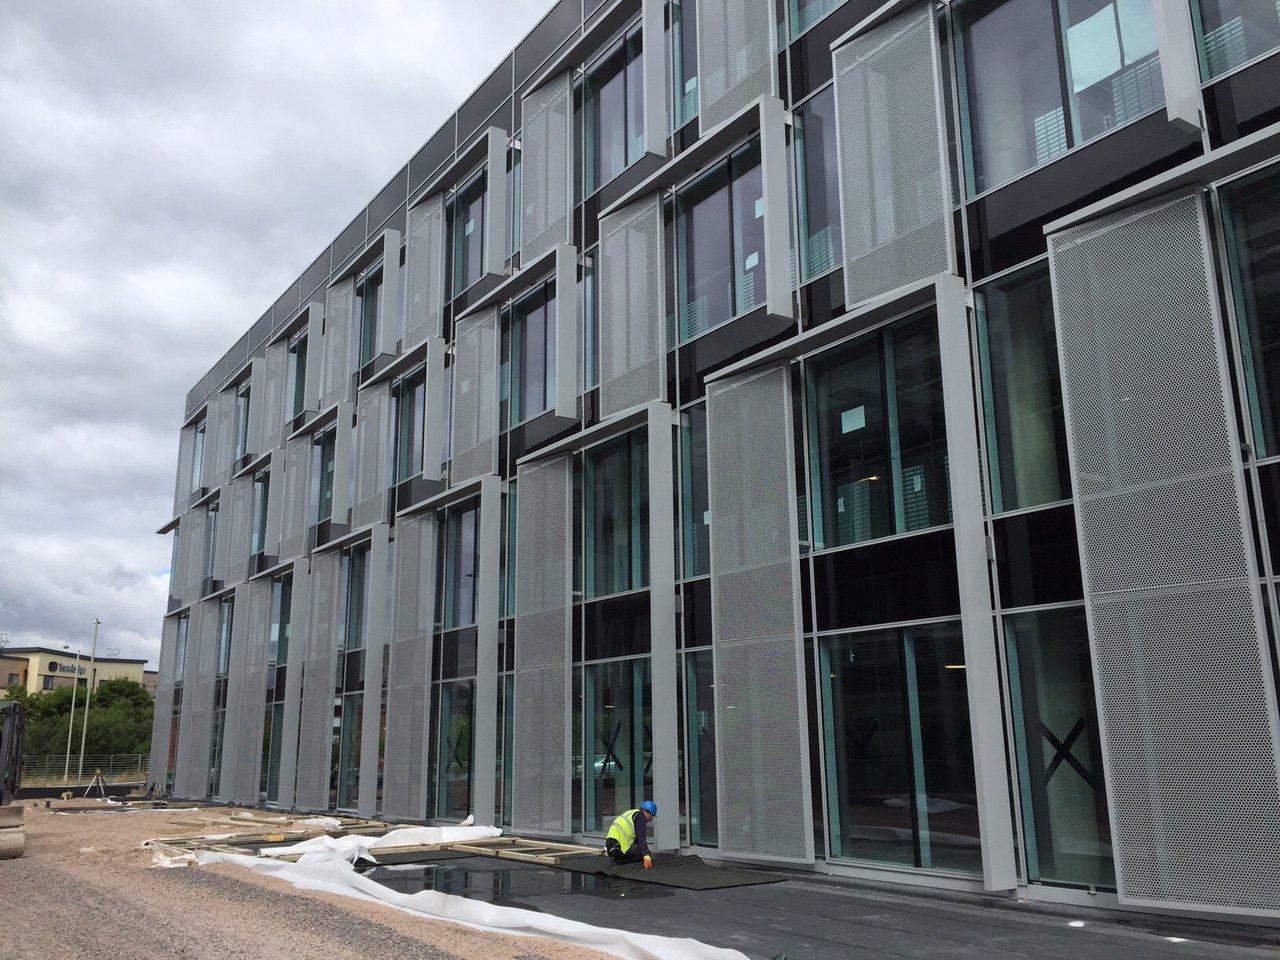 mesh facade cladding systems winnersh UK by AFS international